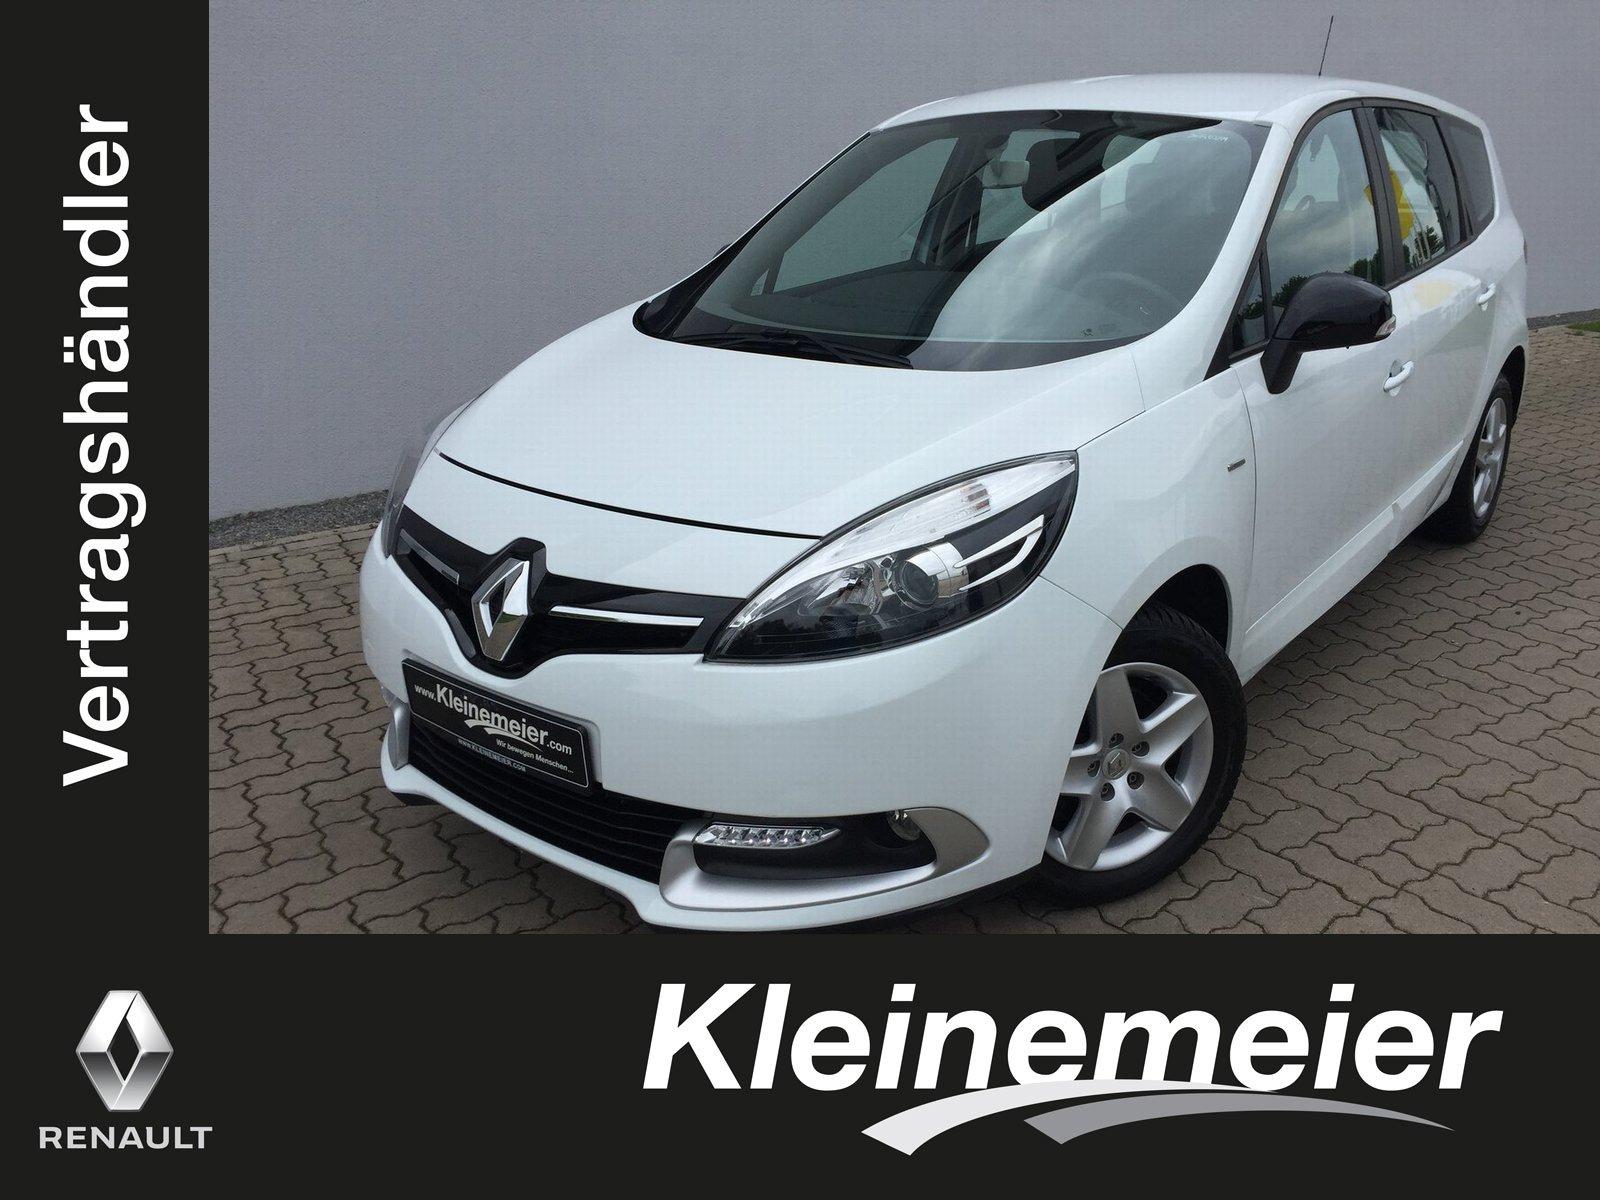 Renault Grand Scenic Limited 1.2 TCe 115*Klima*AHK*, Jahr 2016, Benzin